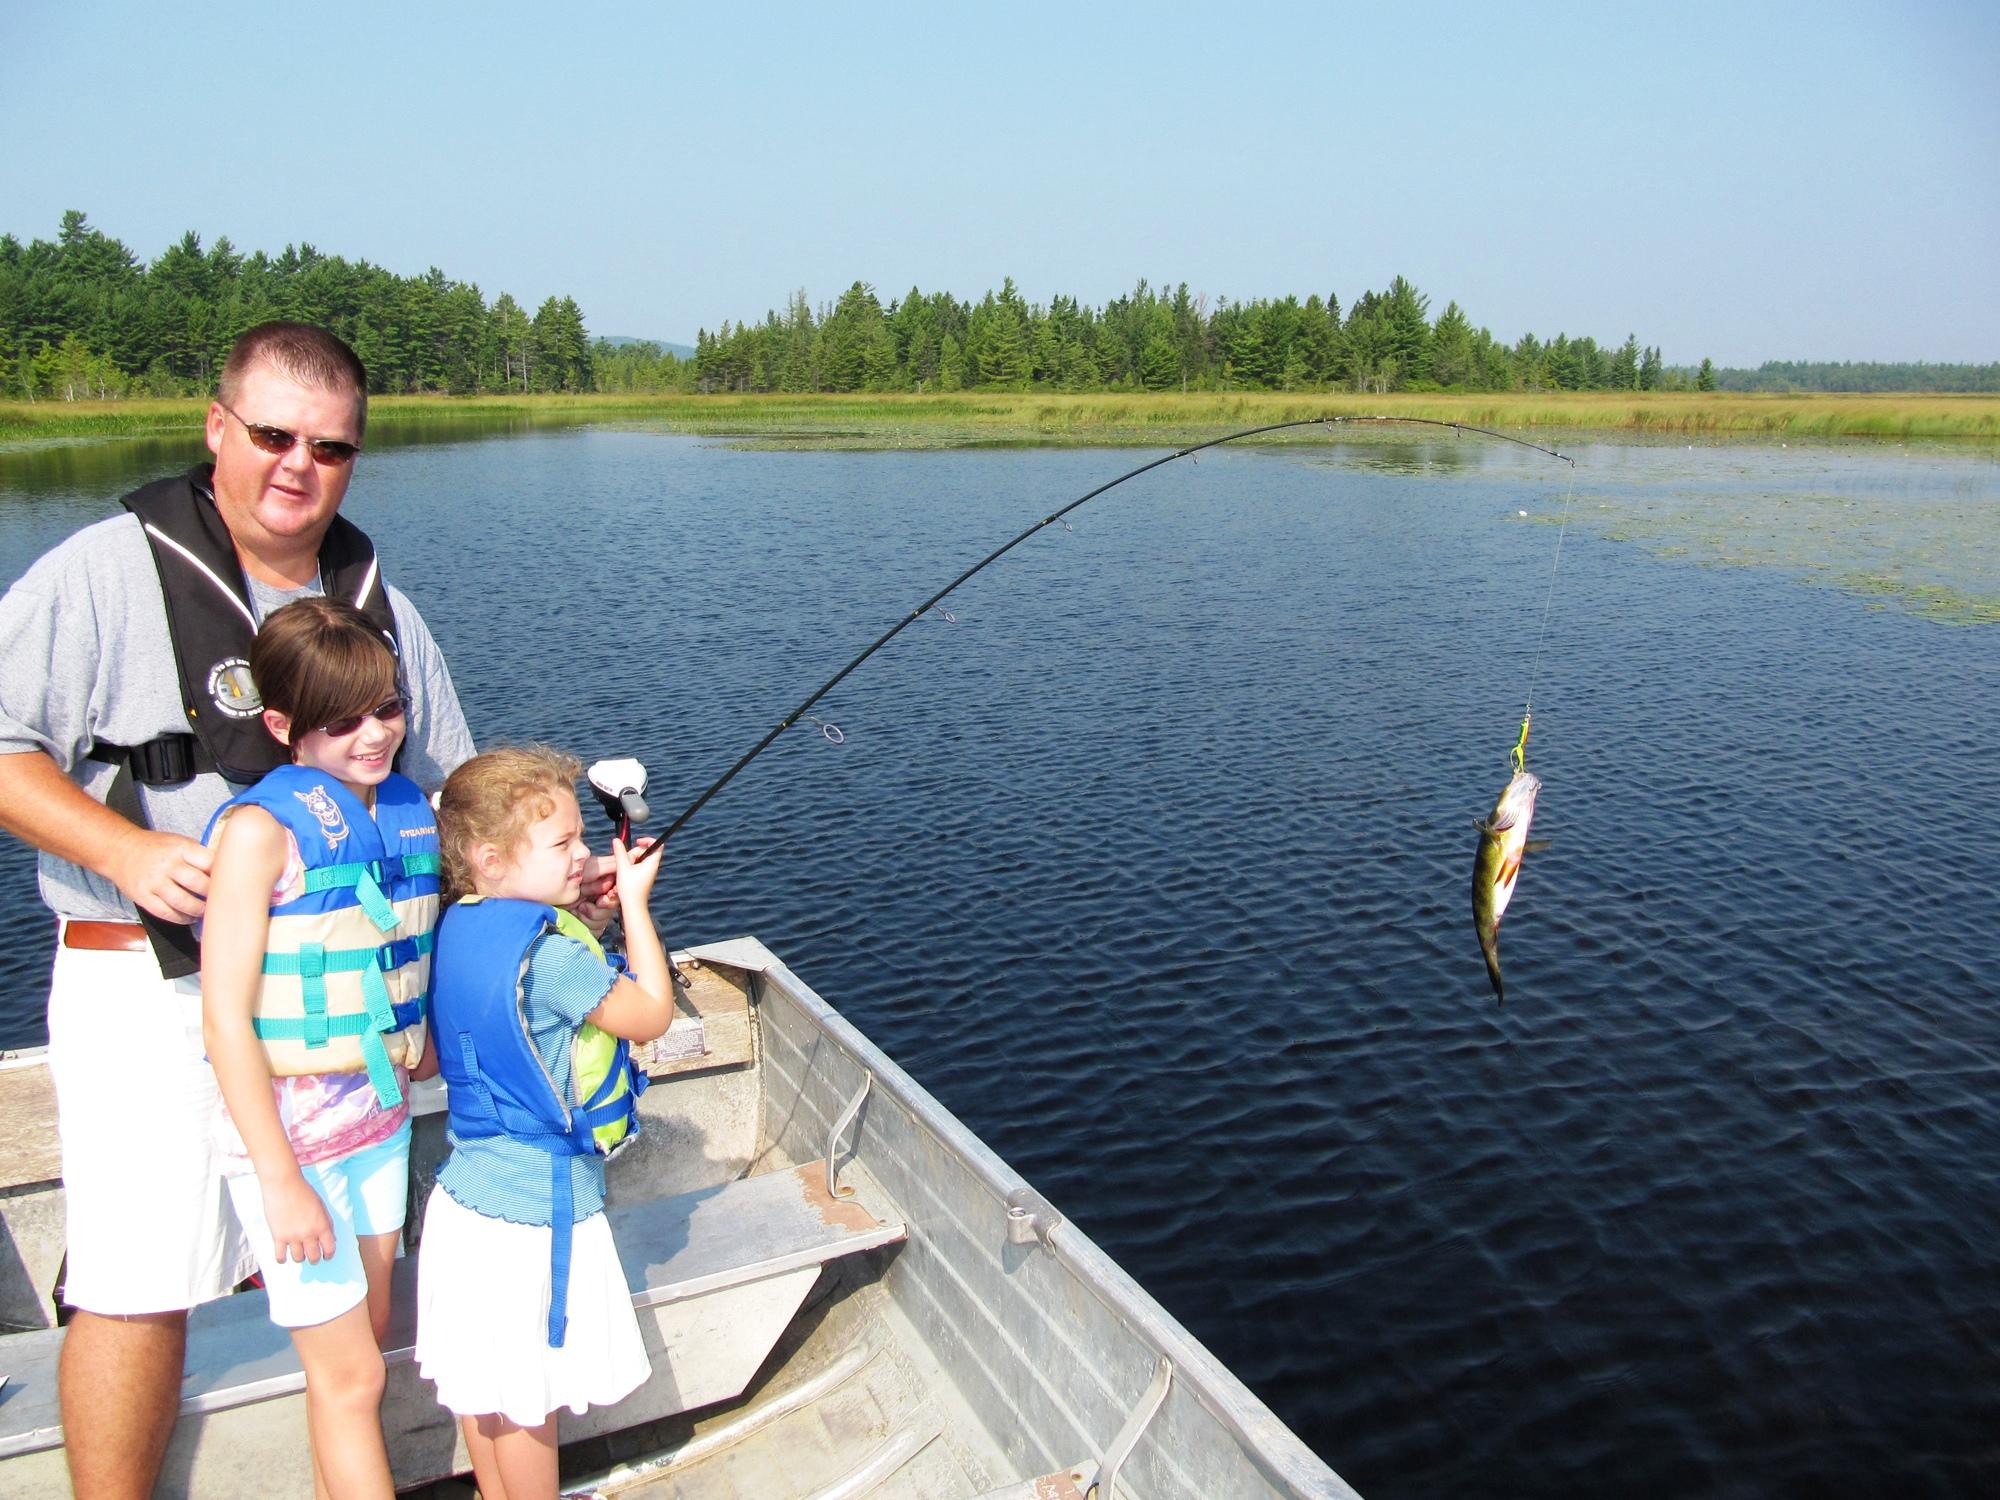 Family fishing on Pocomoonshine Lake